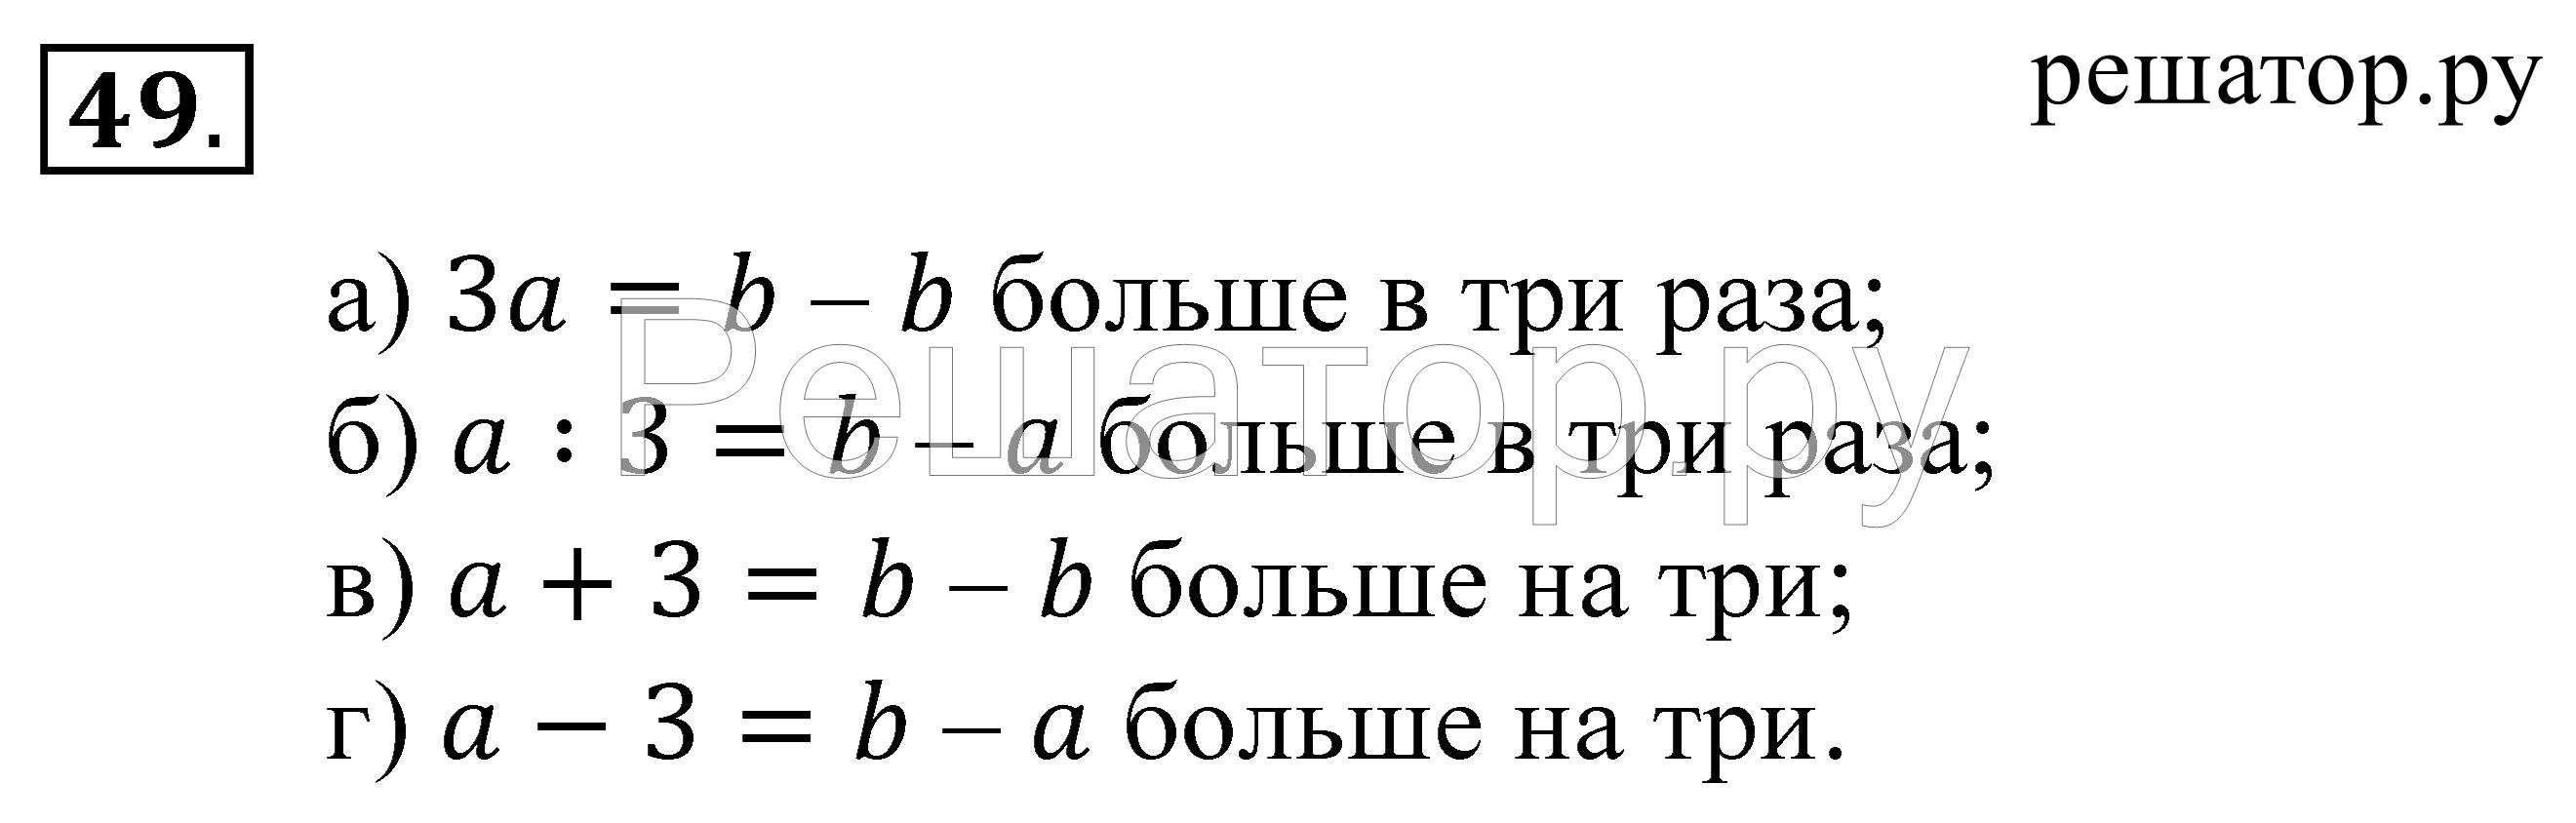 onlayn-reshebnik-po-matematike-za-5-klass-zubareva-mordkovich-predkam